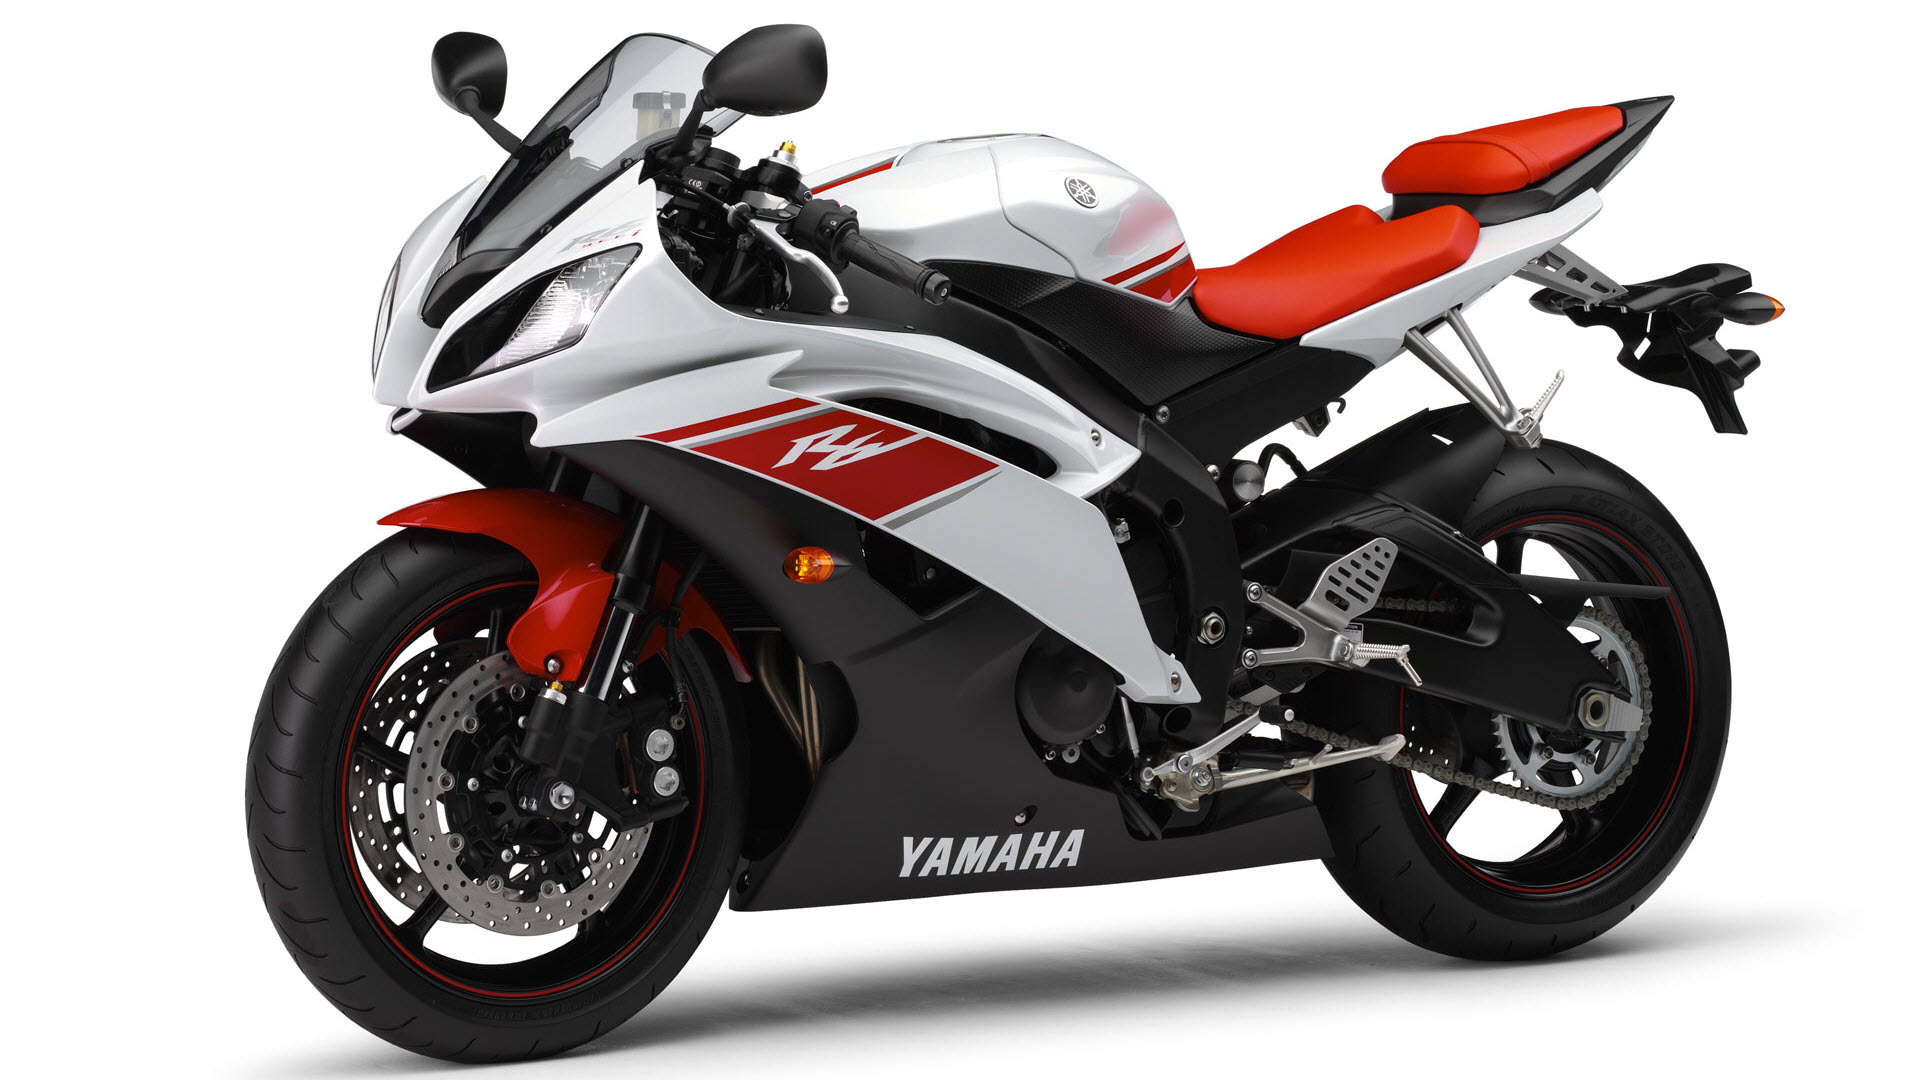 ... yamaha-bike-hd-wallpapers-beautiful-desktop-background-images- ...